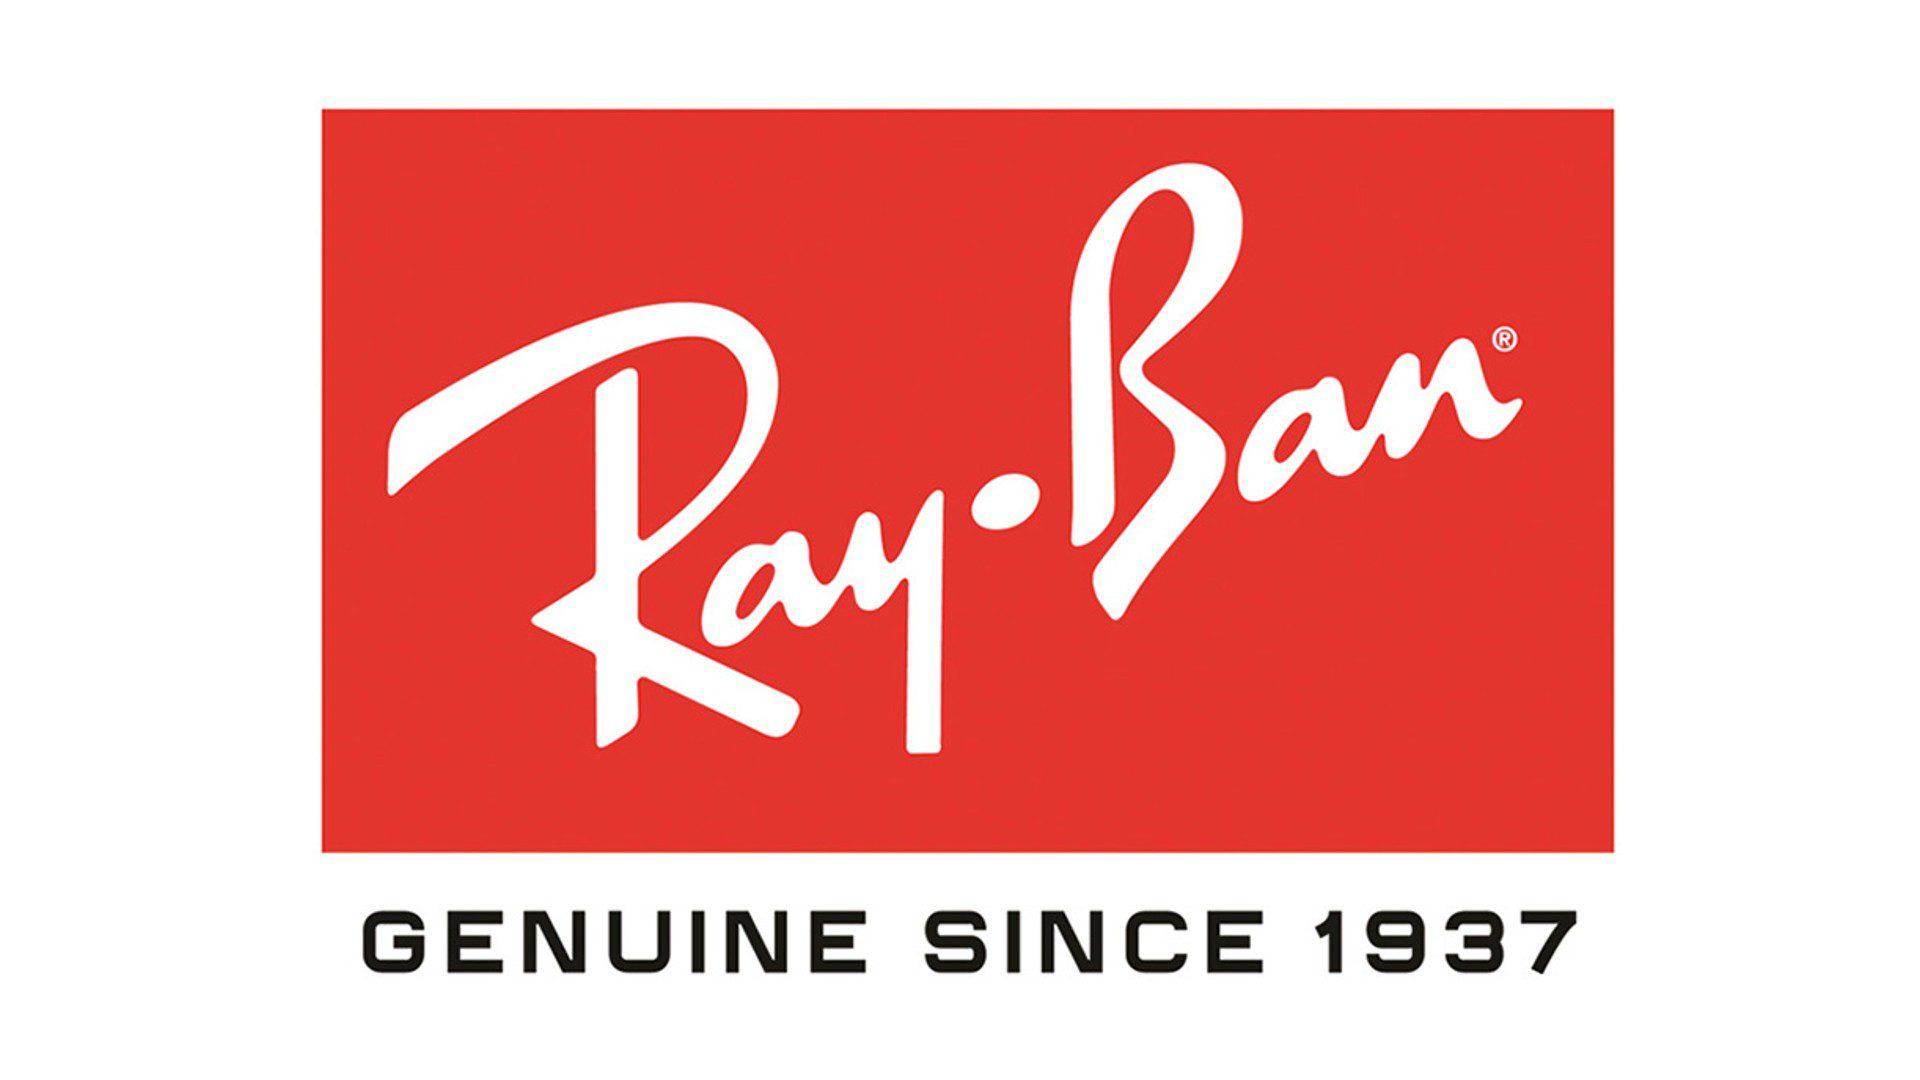 Ray-Ban รุ่นประจำฤดูร้อนปี 2021